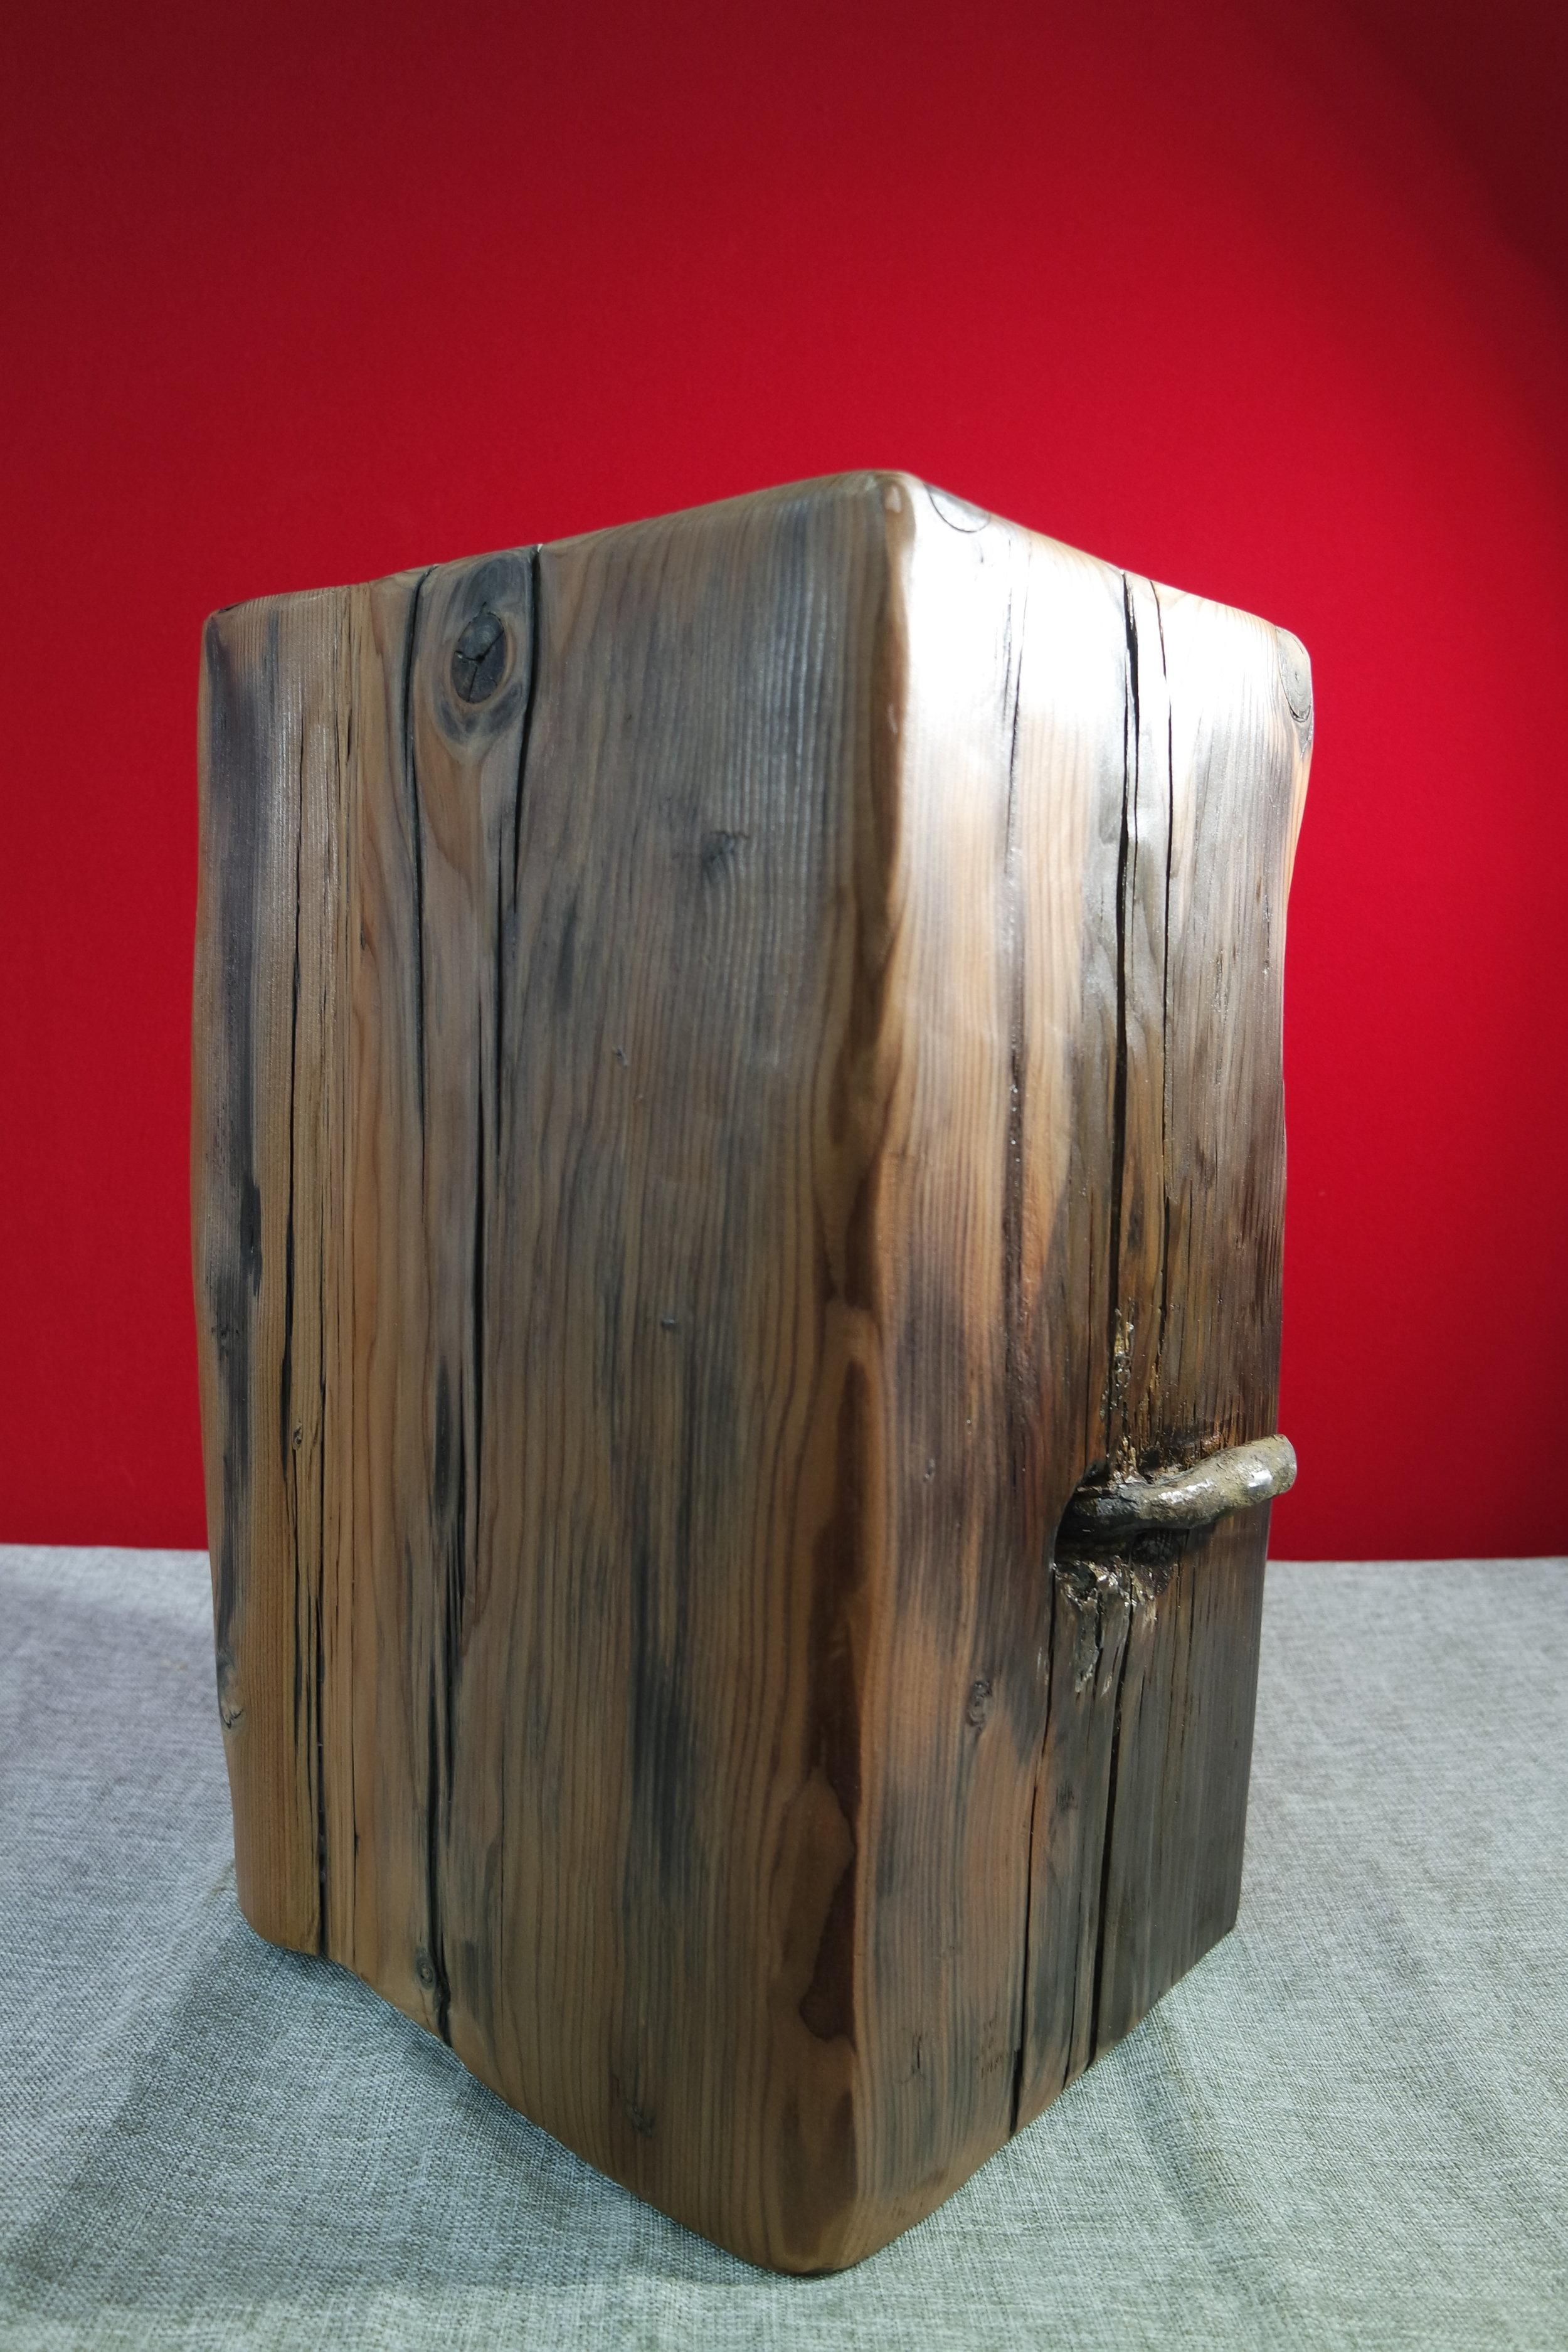 Driftwood Stool with Iron Bolt No I (26).JPG